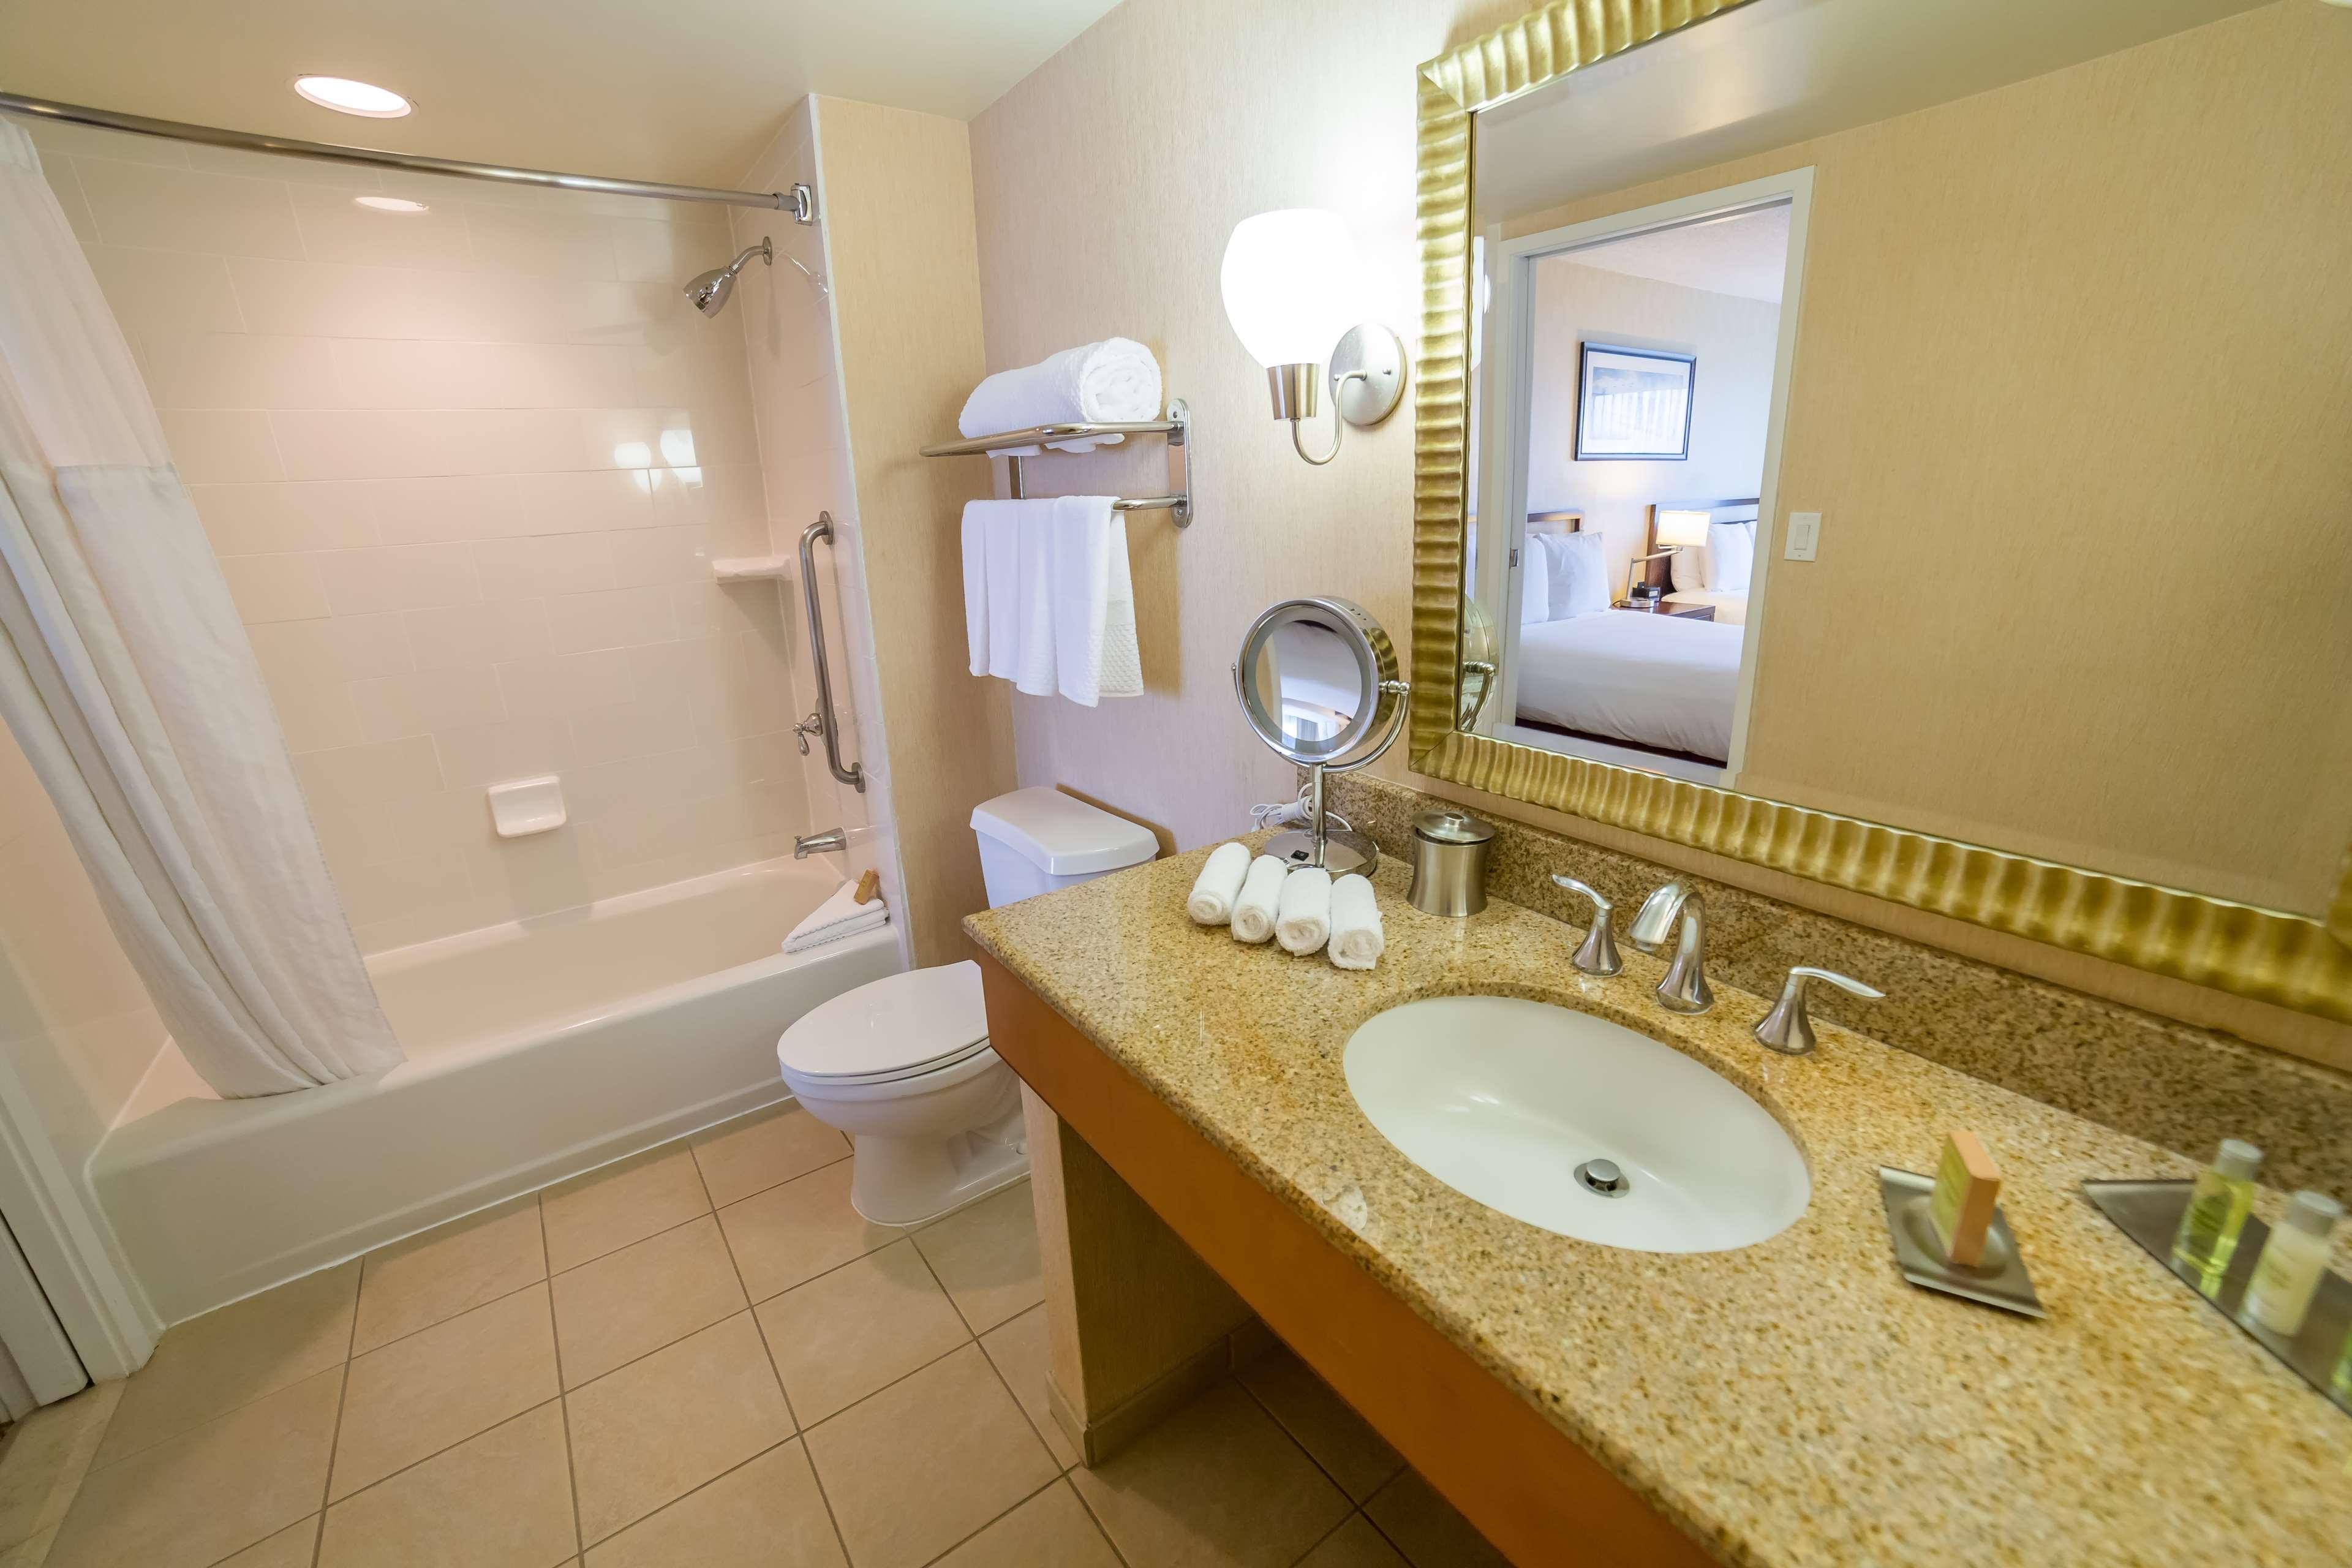 DoubleTree Suites by Hilton Hotel Santa Monica image 7